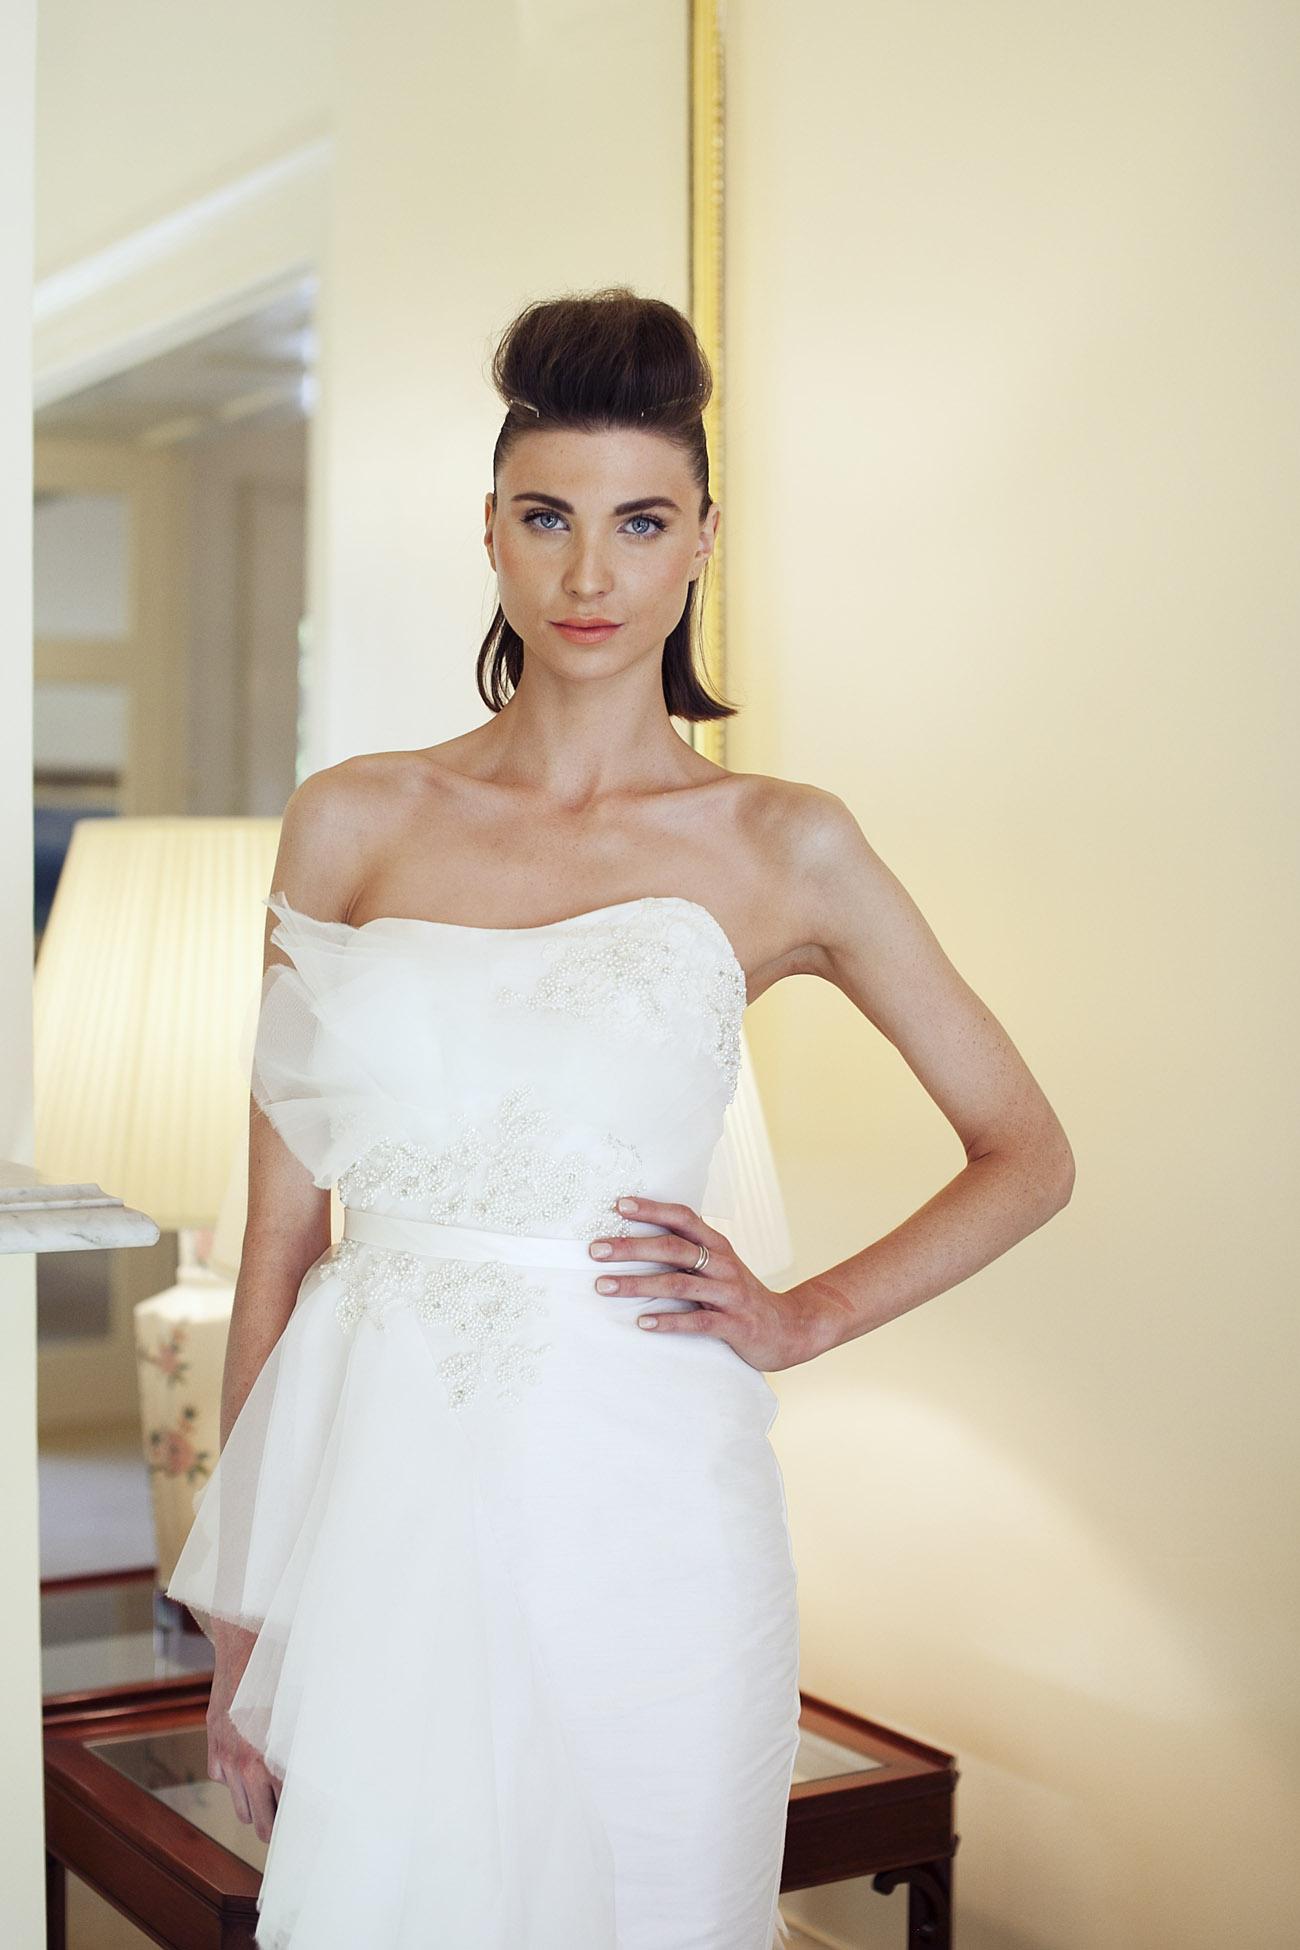 Finesse Models' Rebecca Niven